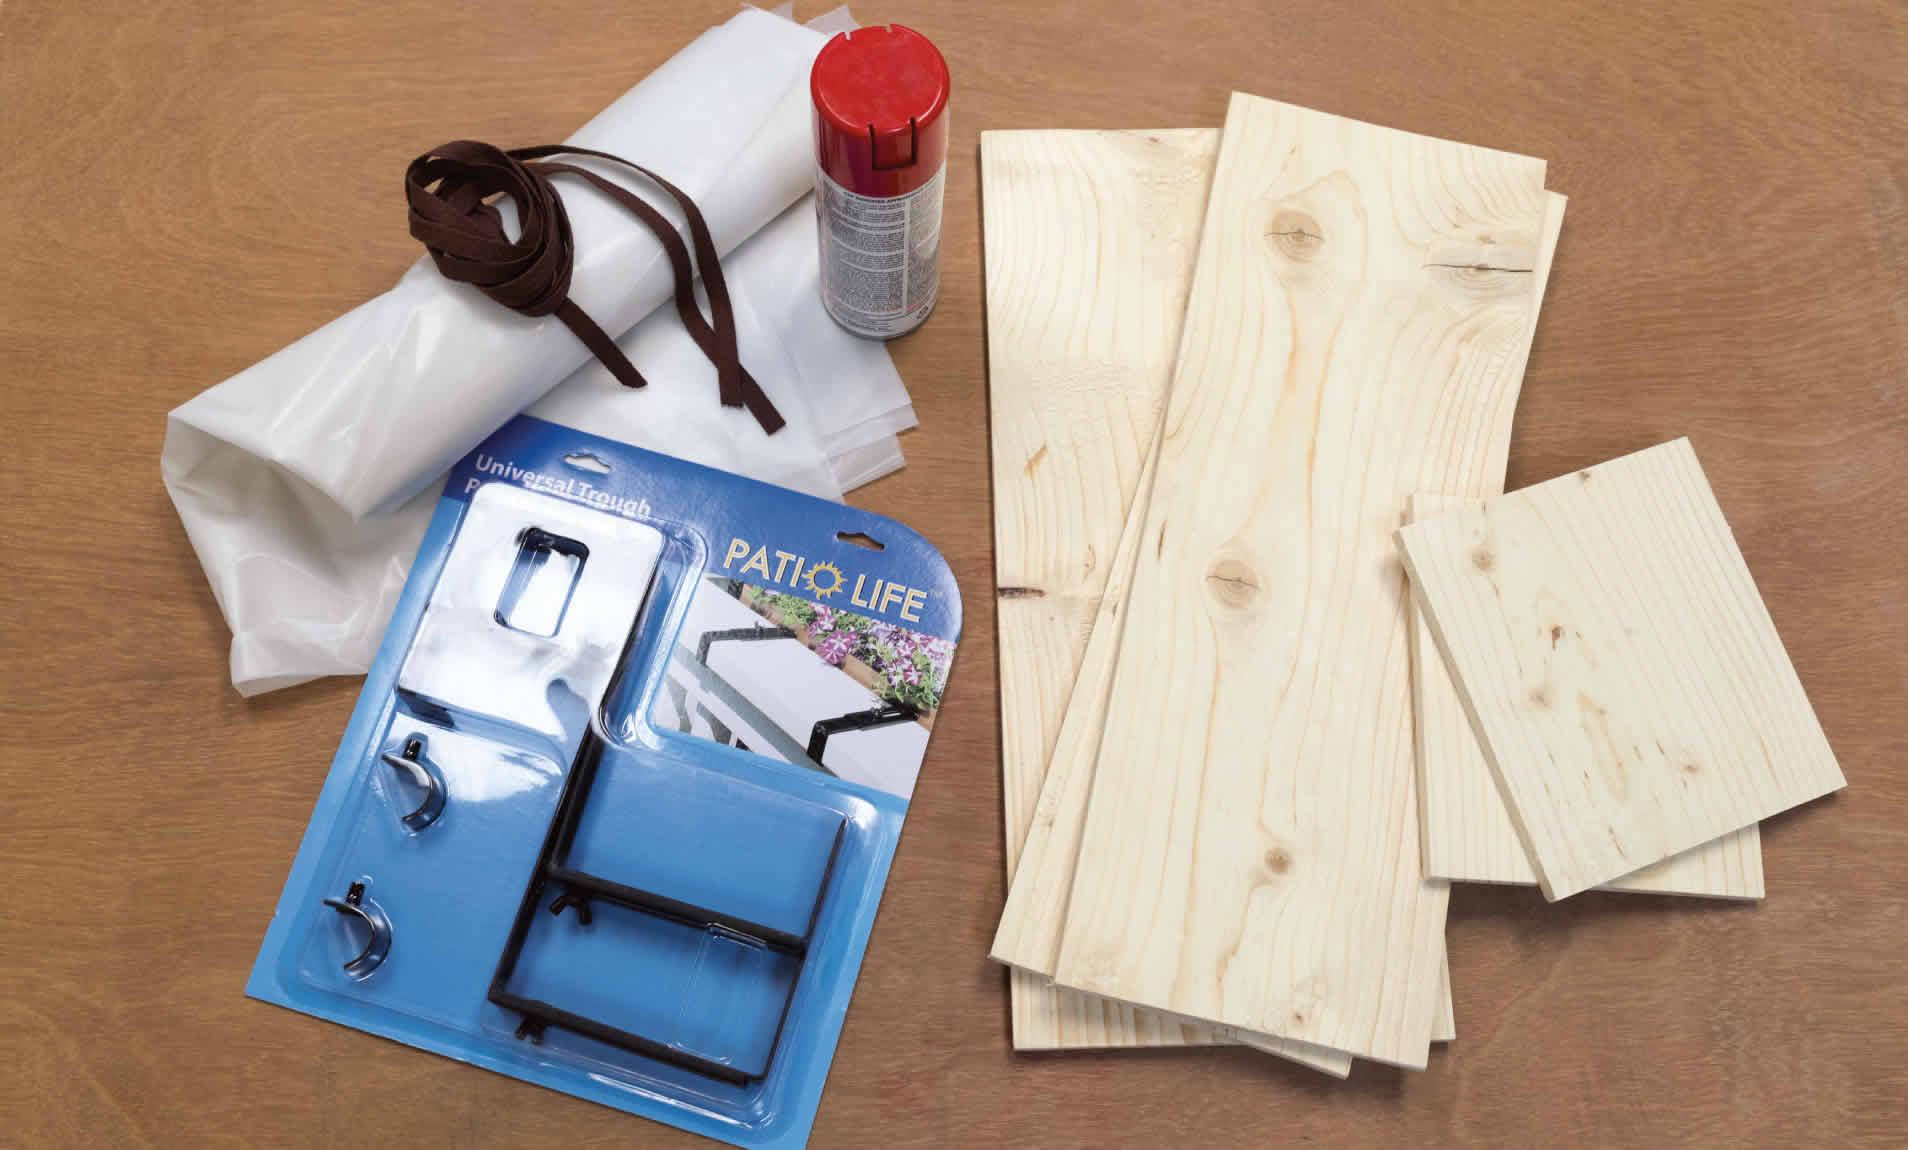 outdoor-flower-box-arrow-project-supplies